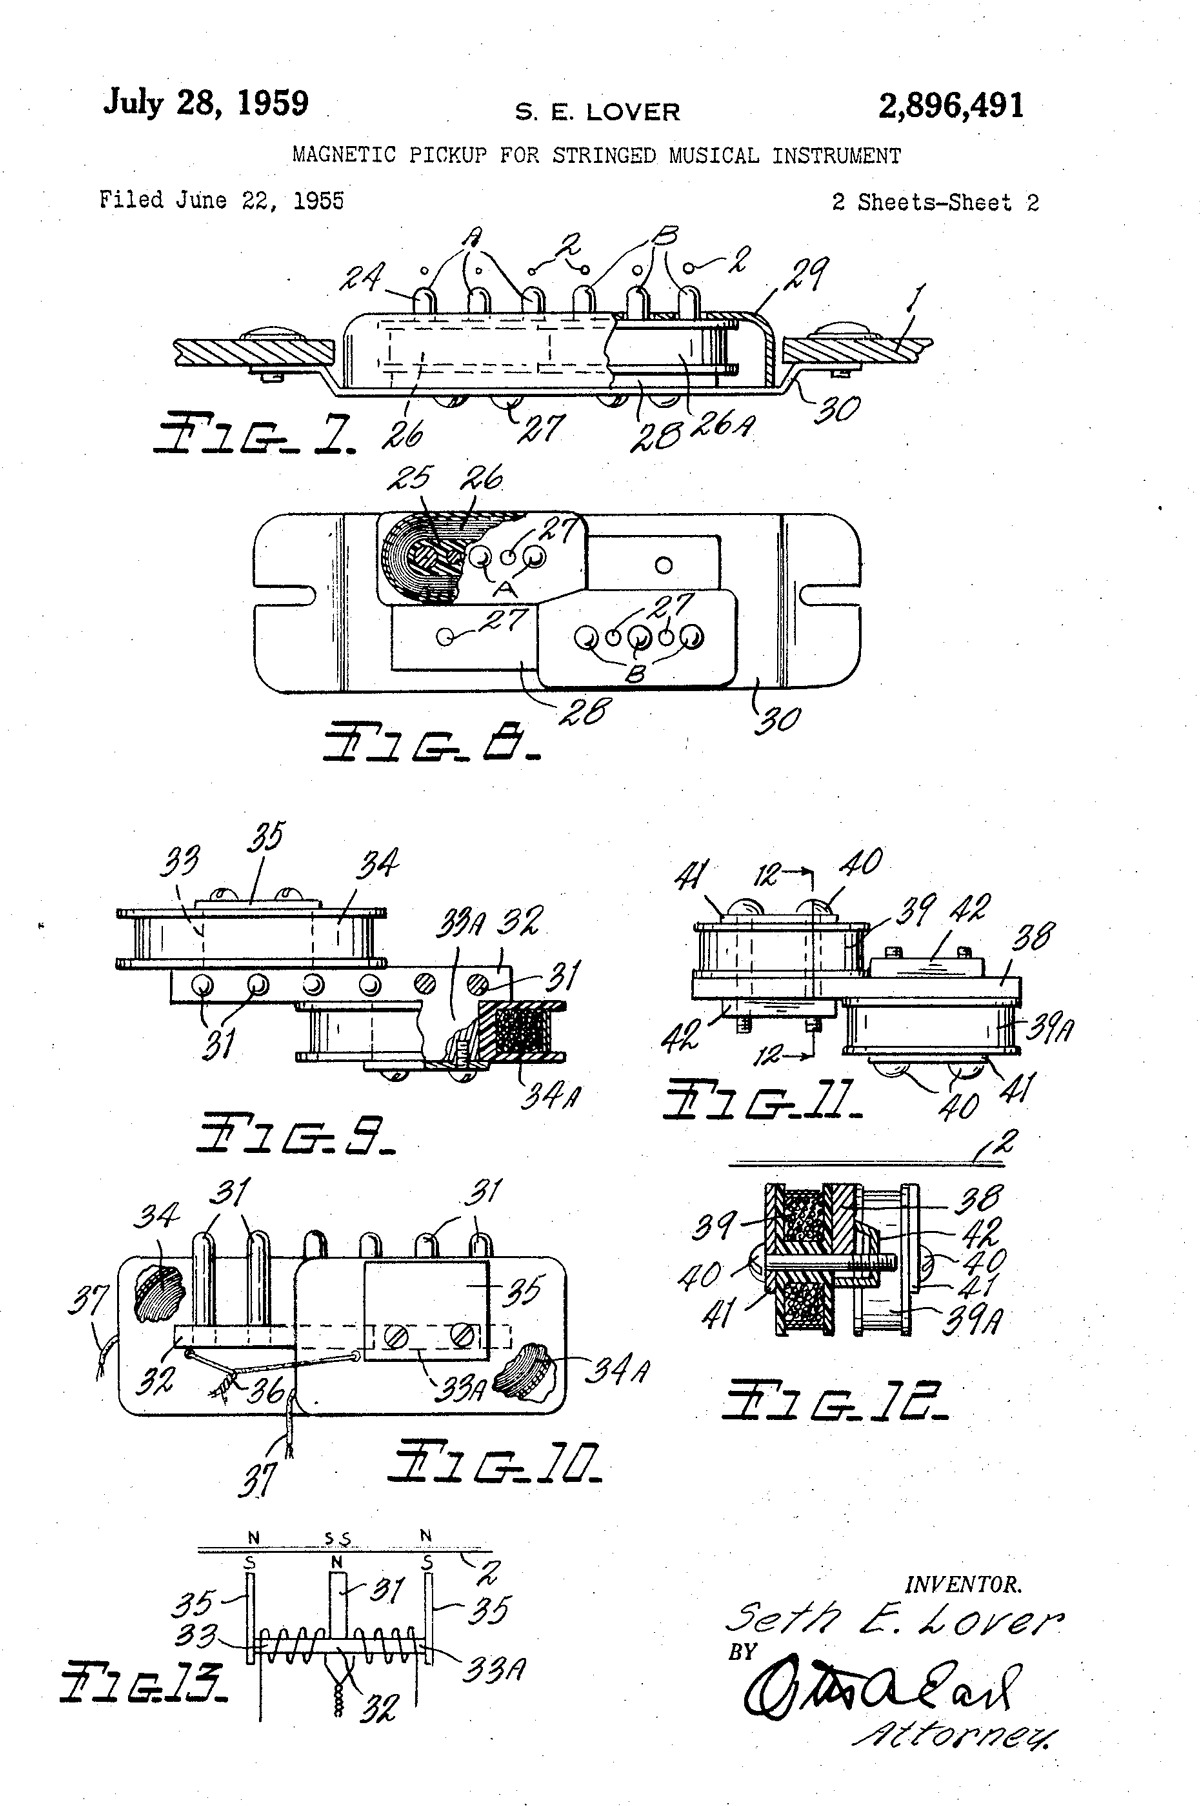 GibsonのP.A.Fの特許書類